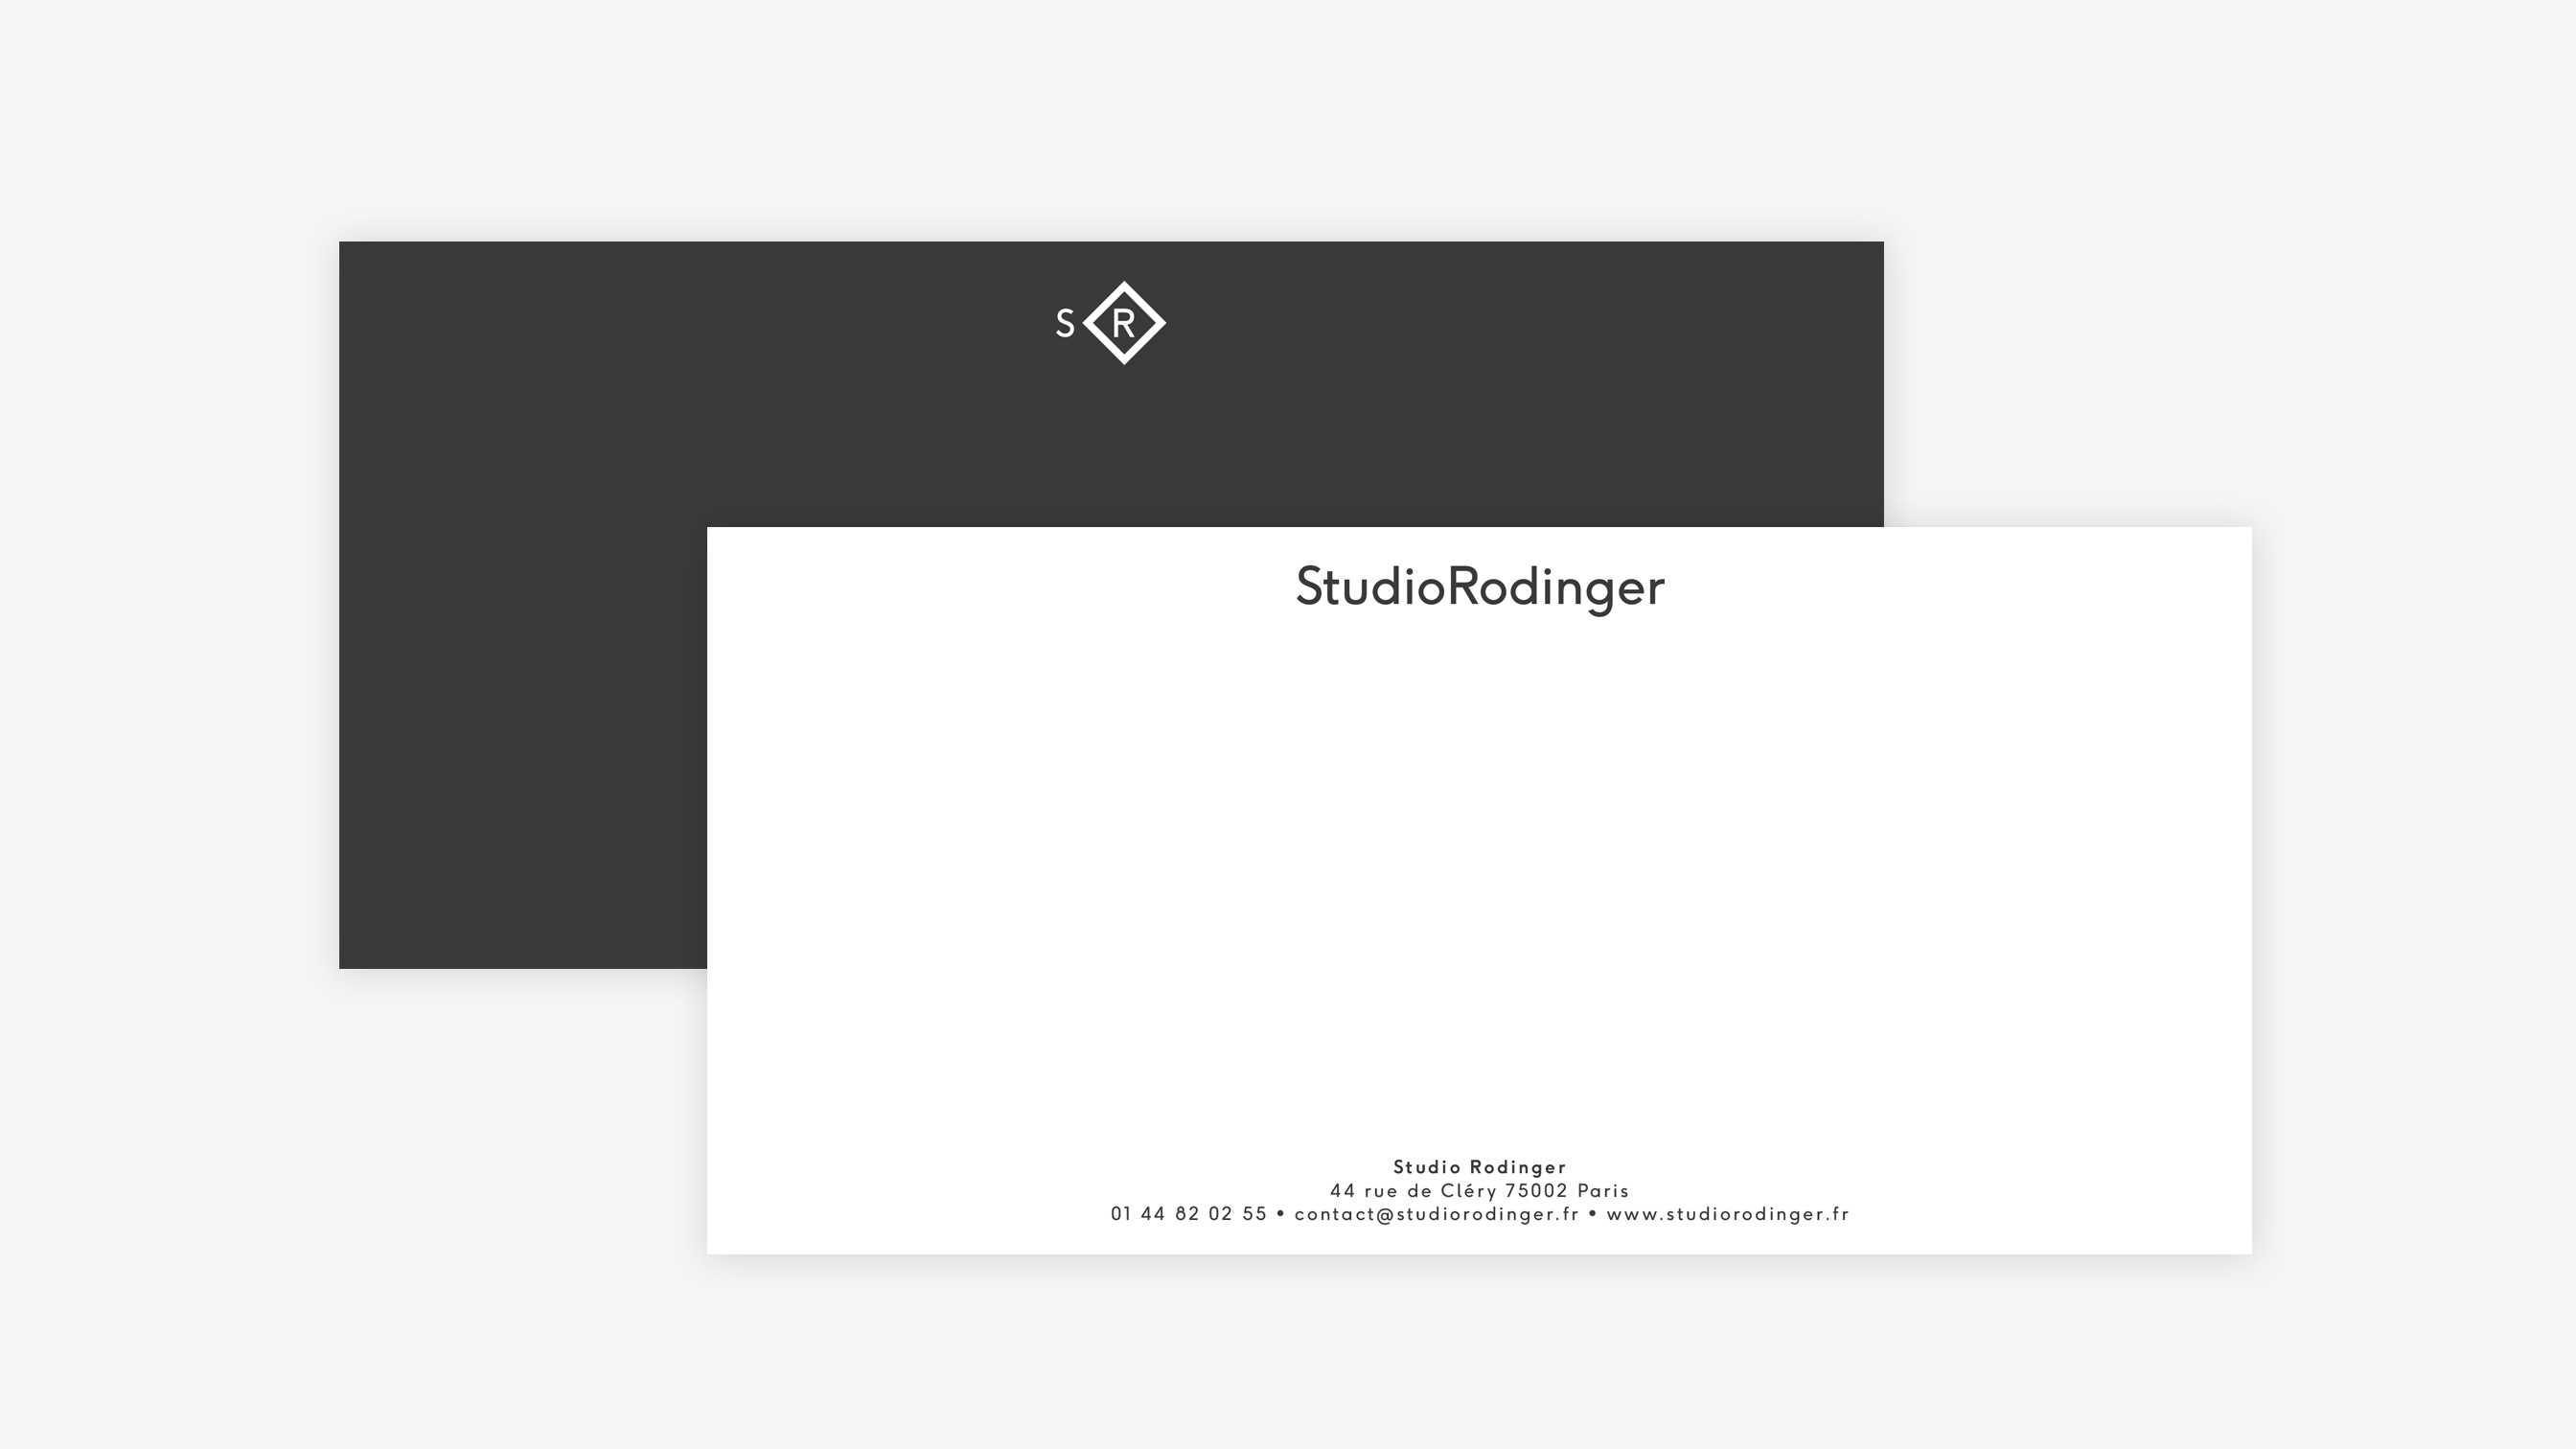 06-studio-rodinger-pikteo-webdesign-graphic-design-freelance-paris-bruxelles-londres